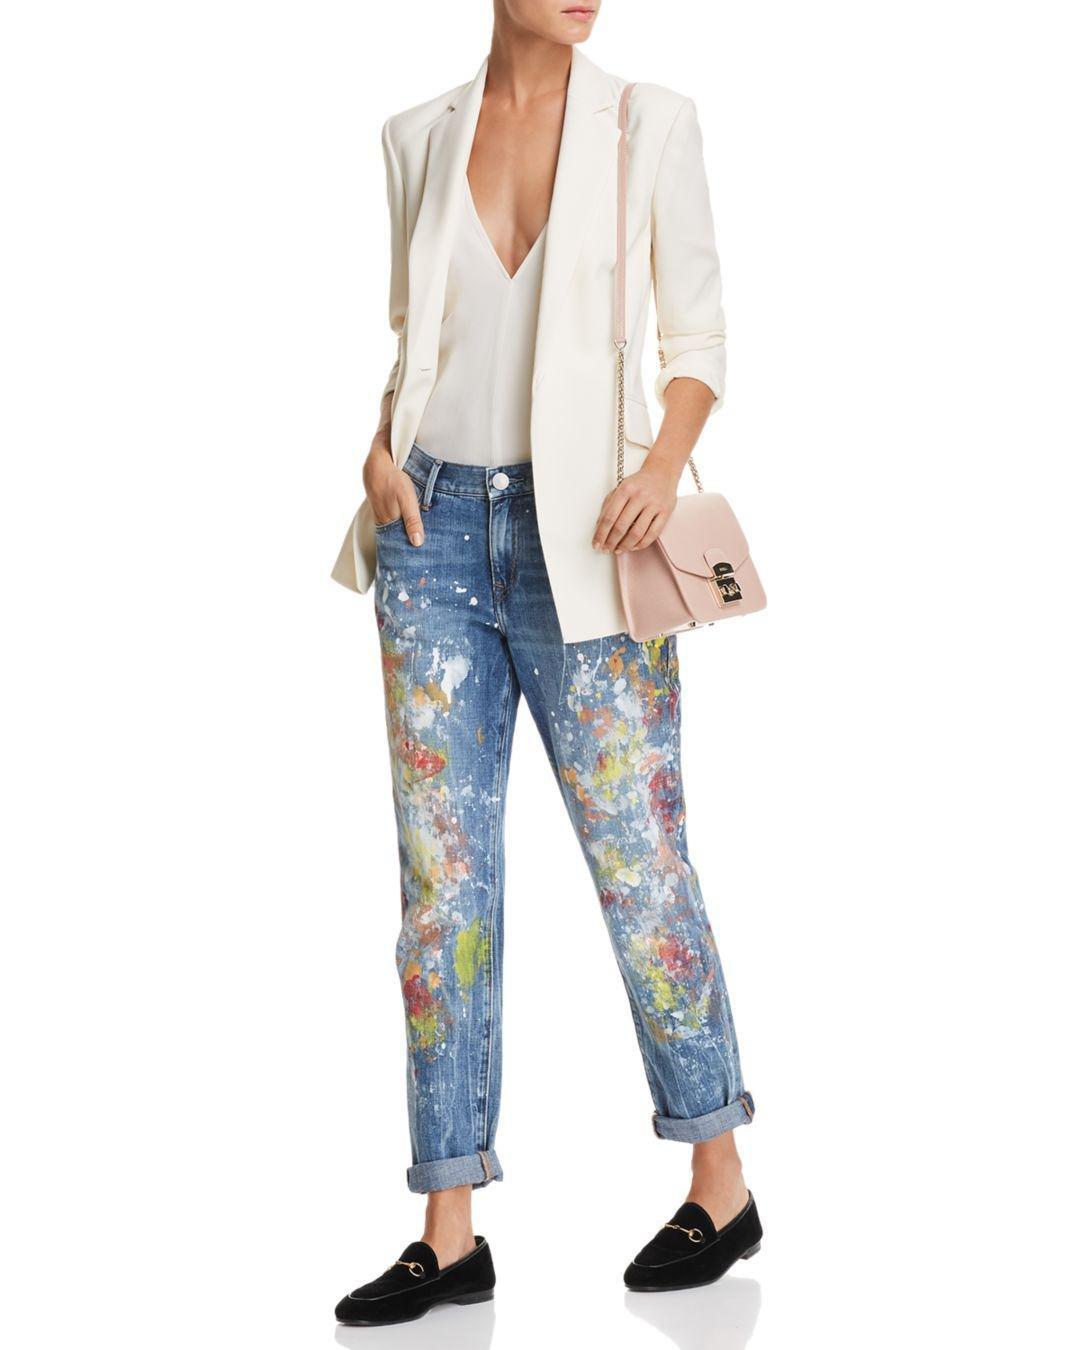 6e2e9031a True Religion Cameron Boyfriend Jeans In Pop Art Paint in Blue - Save 80% -  Lyst